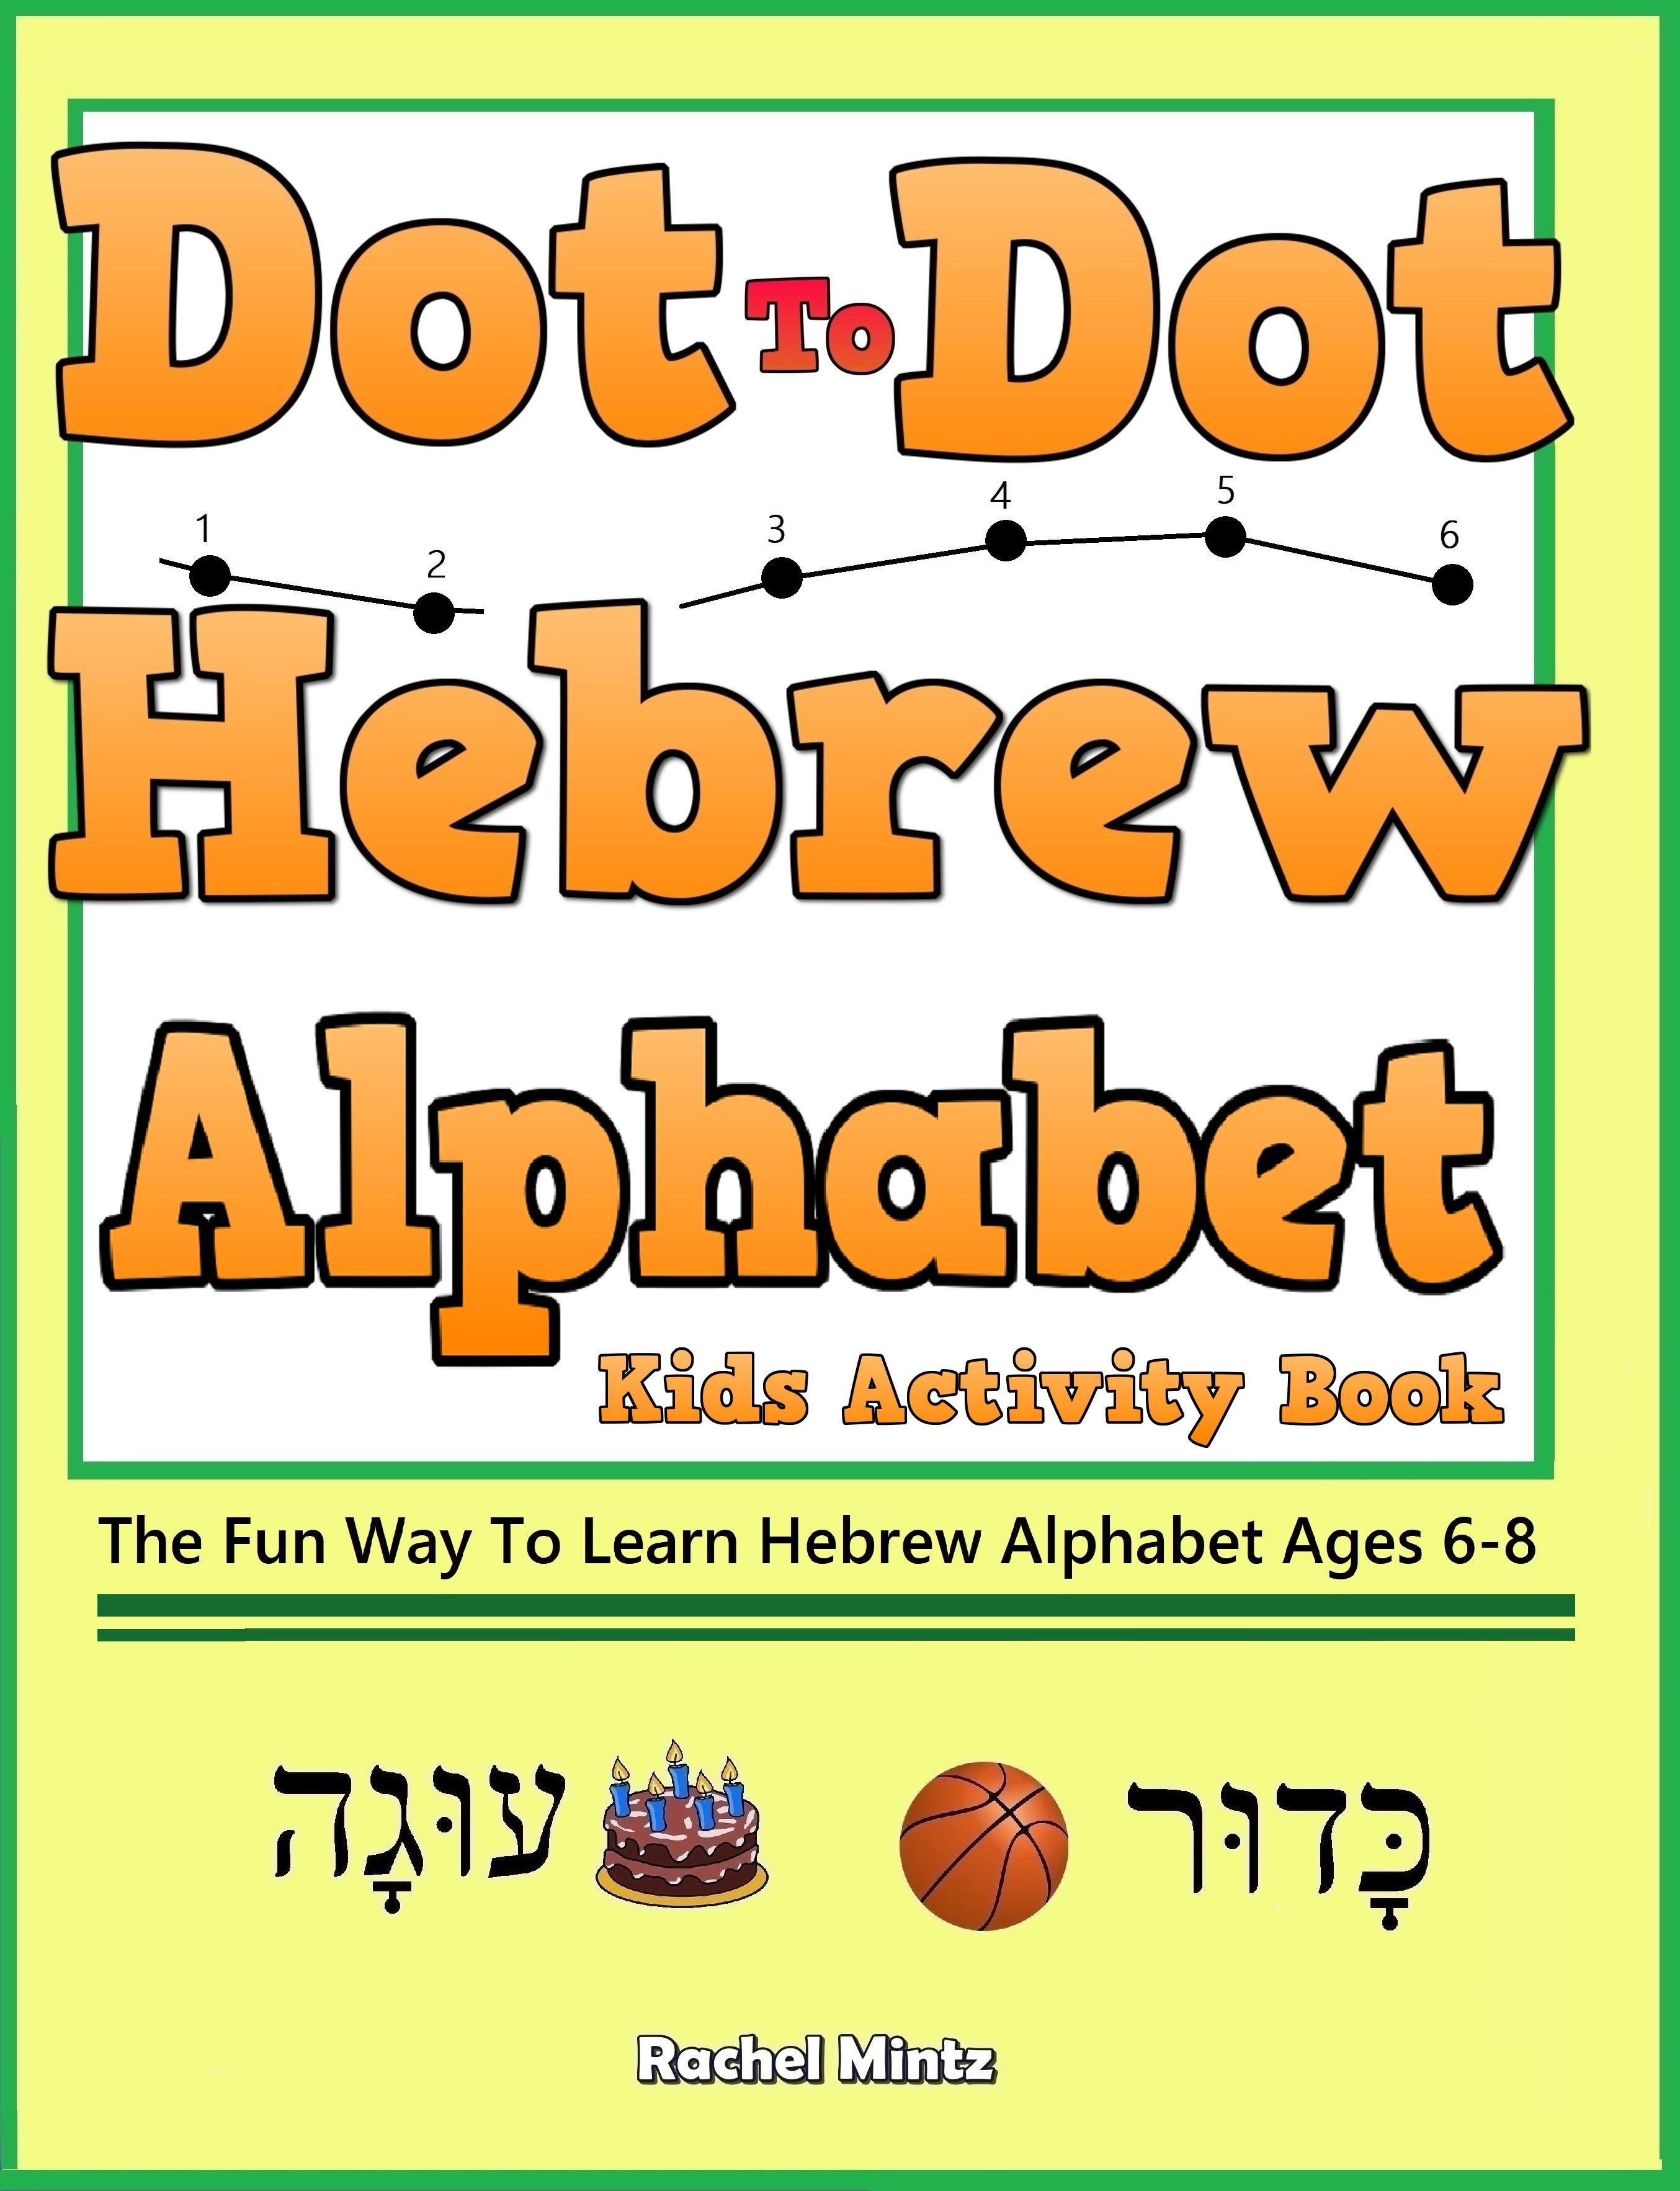 Learning Hebrew Alphabet